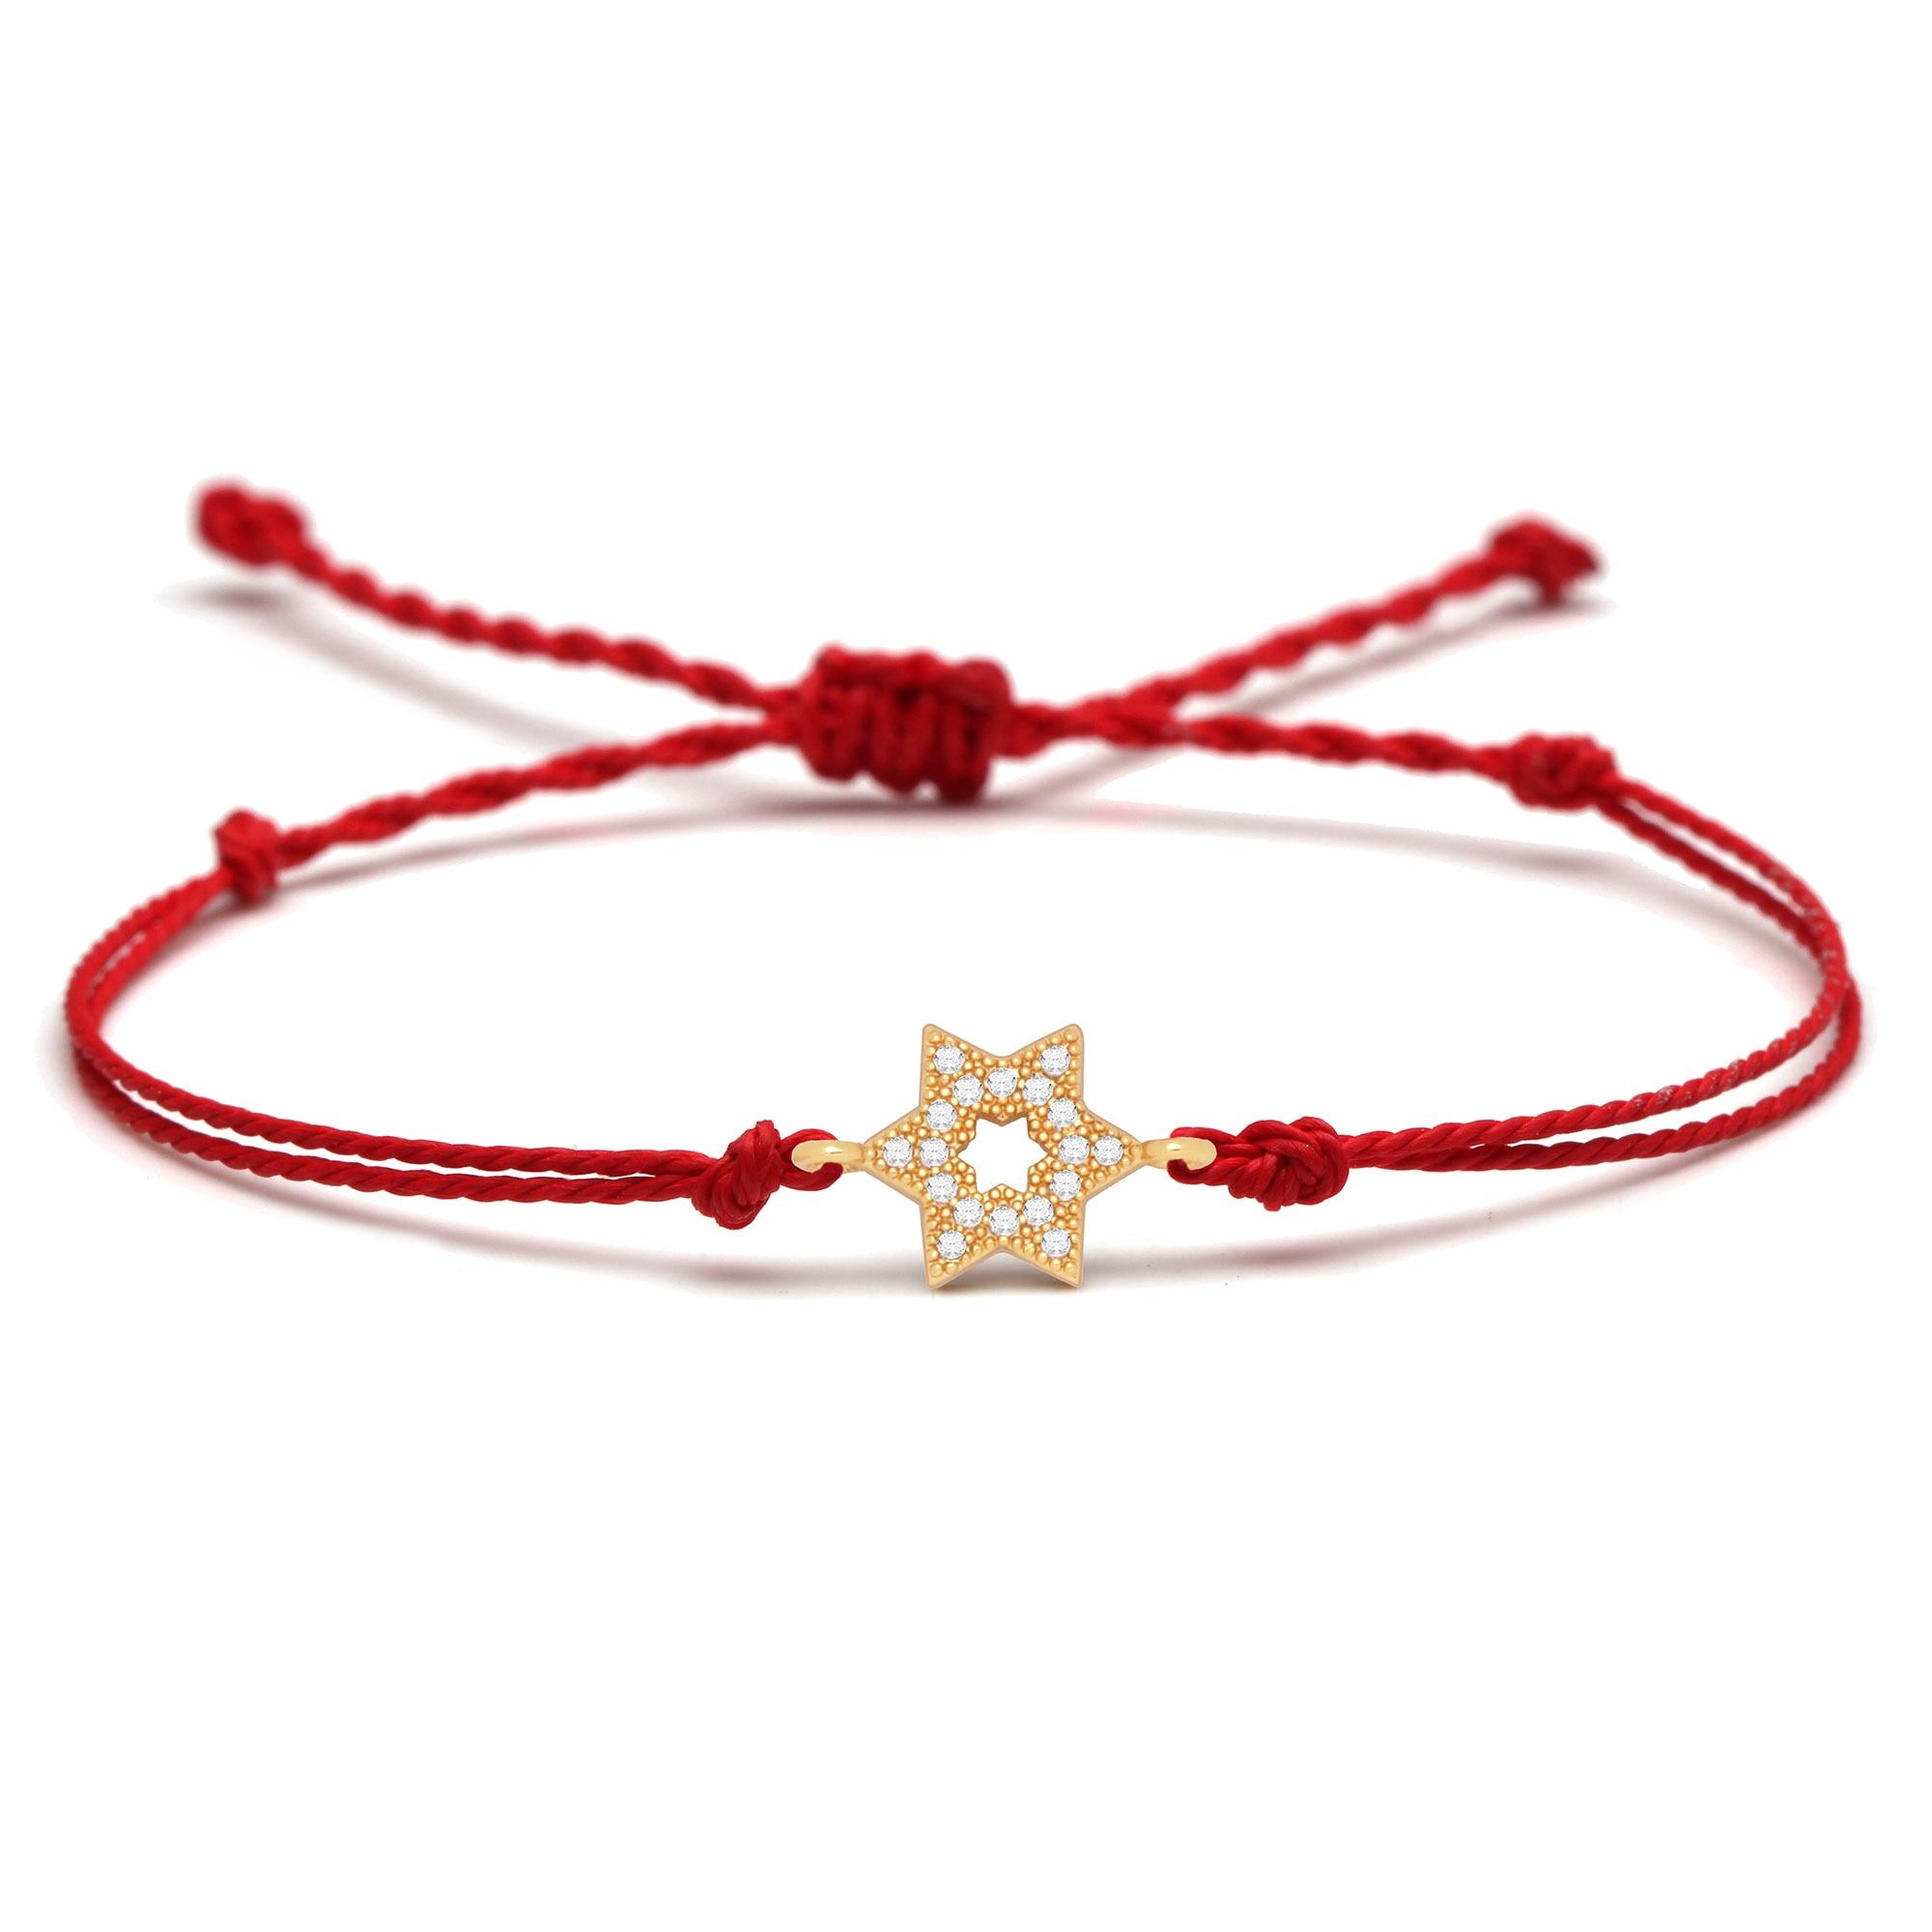 White Cubic Zirconia Crystal Jewish Stars Charm Bracelet Women Men Red Waxed String Kabalah Magen David Braided Jewelry Gift|Charm Bracelets| - AliExpress